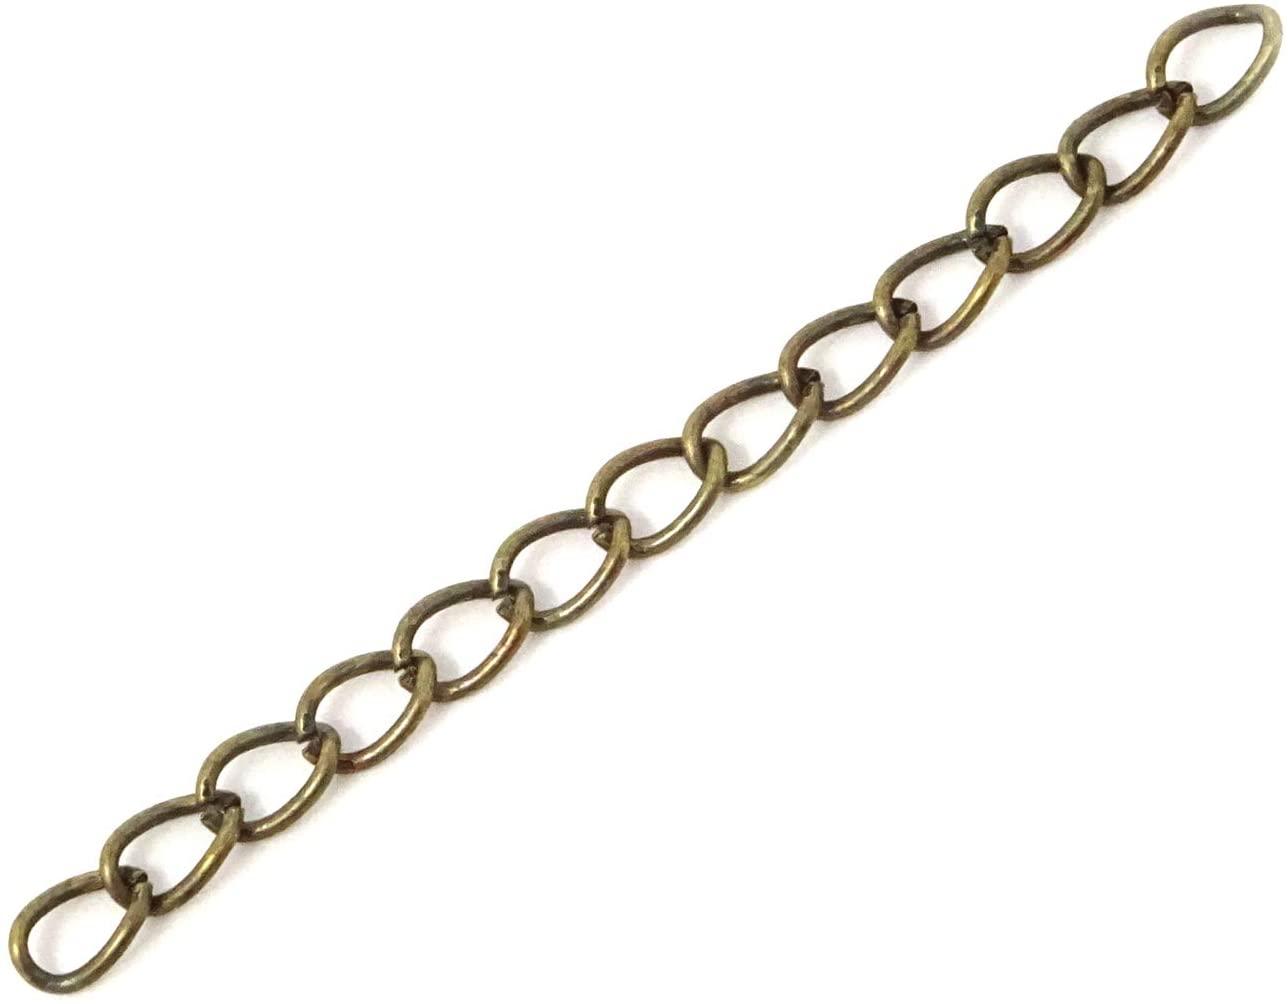 Honbay 100PCS 50mm x 3.5mm Extender Chain for Jewelry Necklace Bracelet Anklet (Bronze)